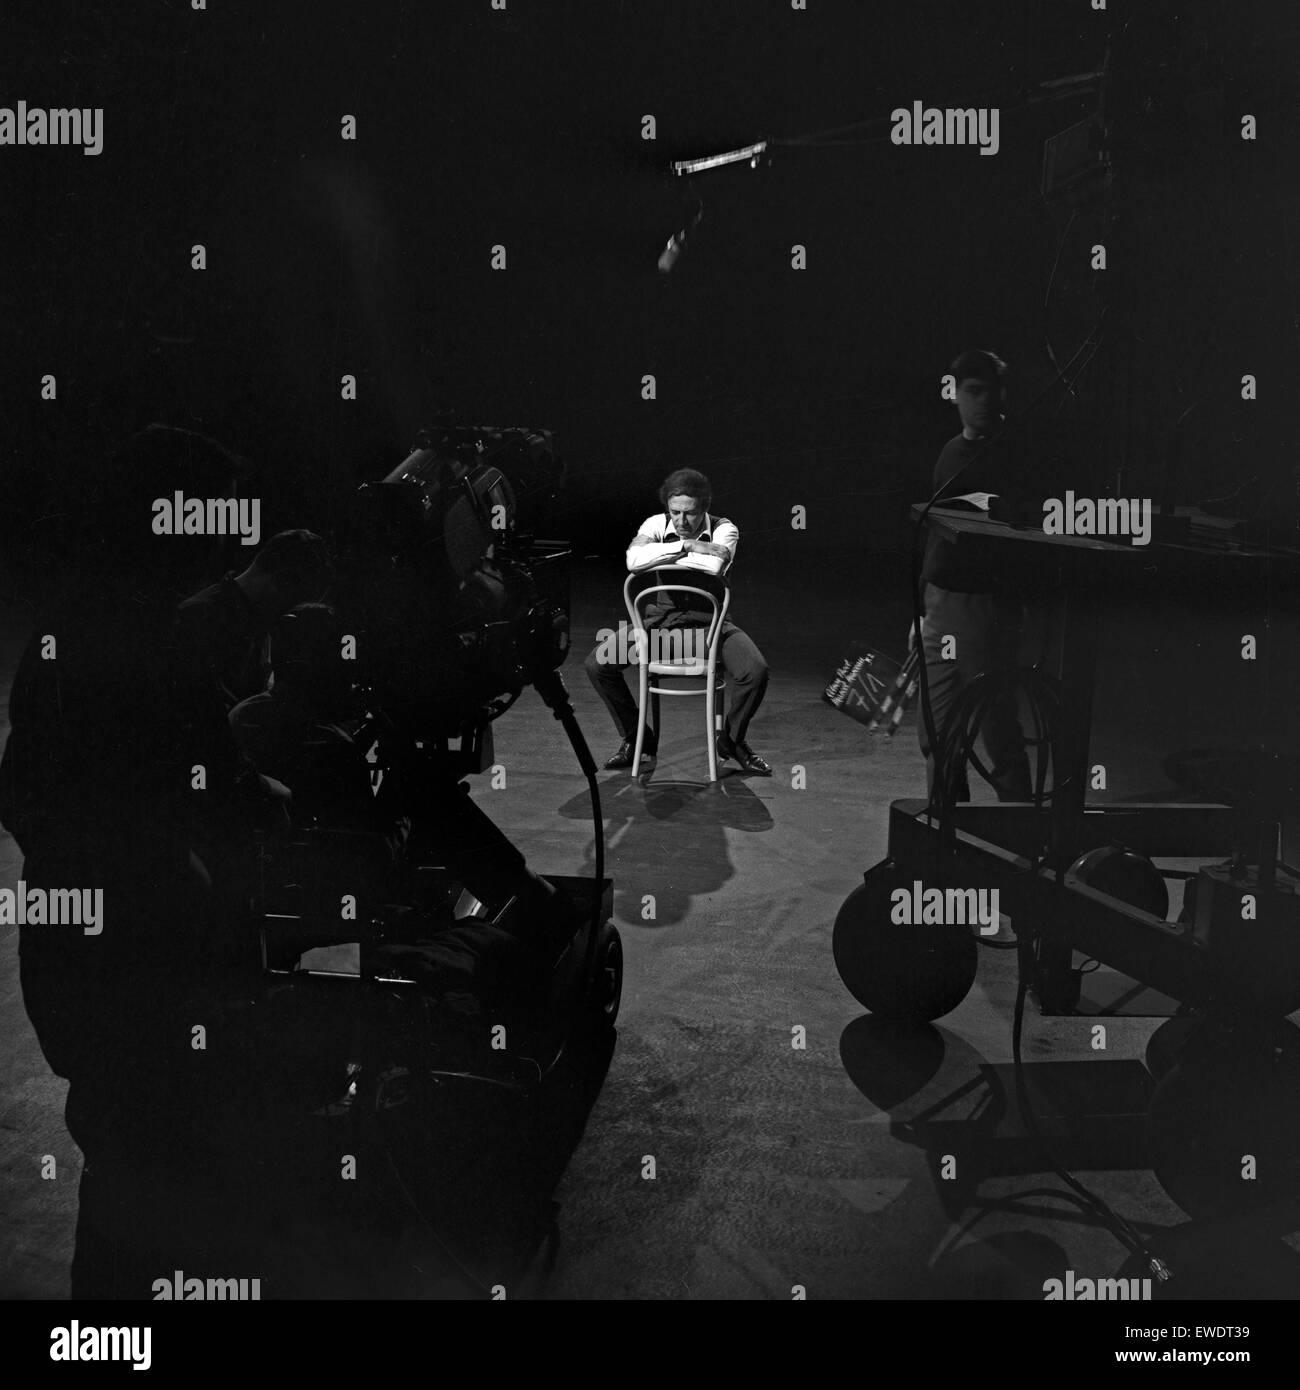 Französischer Pantomime Marcel Marceau in Hamburg, Deutschland 1960er Jahre. French pantomime Marcel Marceau performing Stock Photo